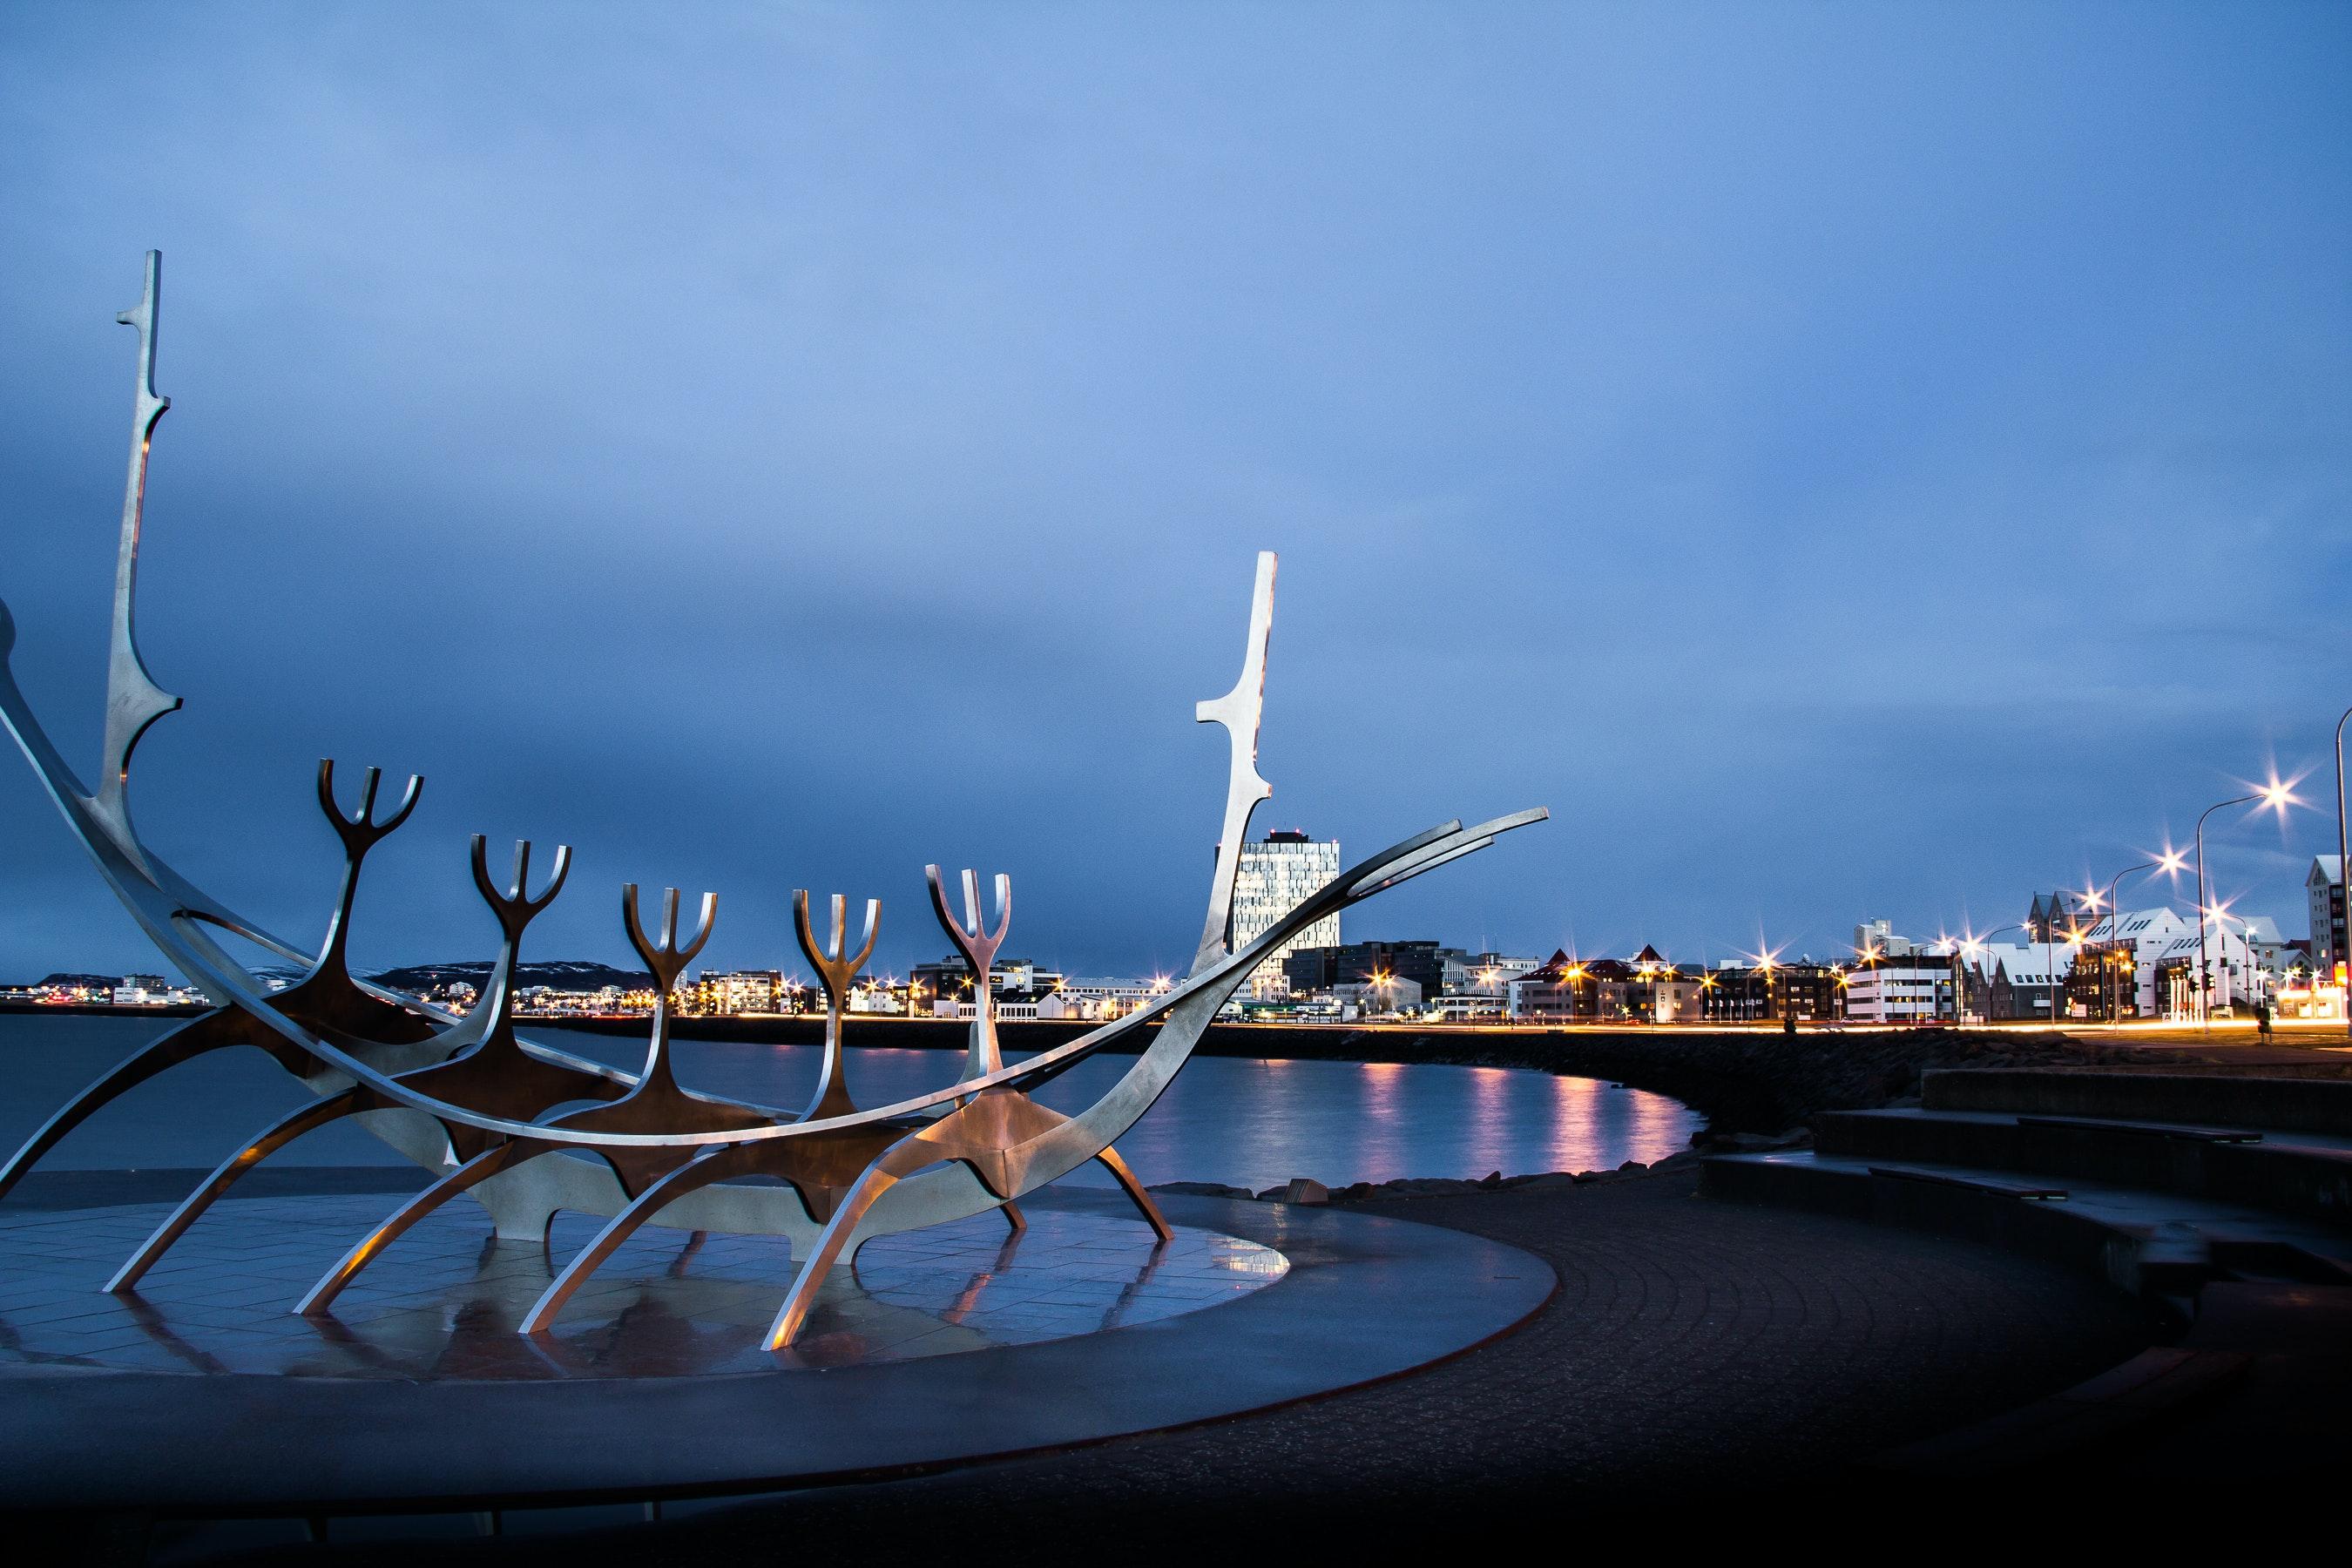 Solfarið or sun-voyager in Reykjavík